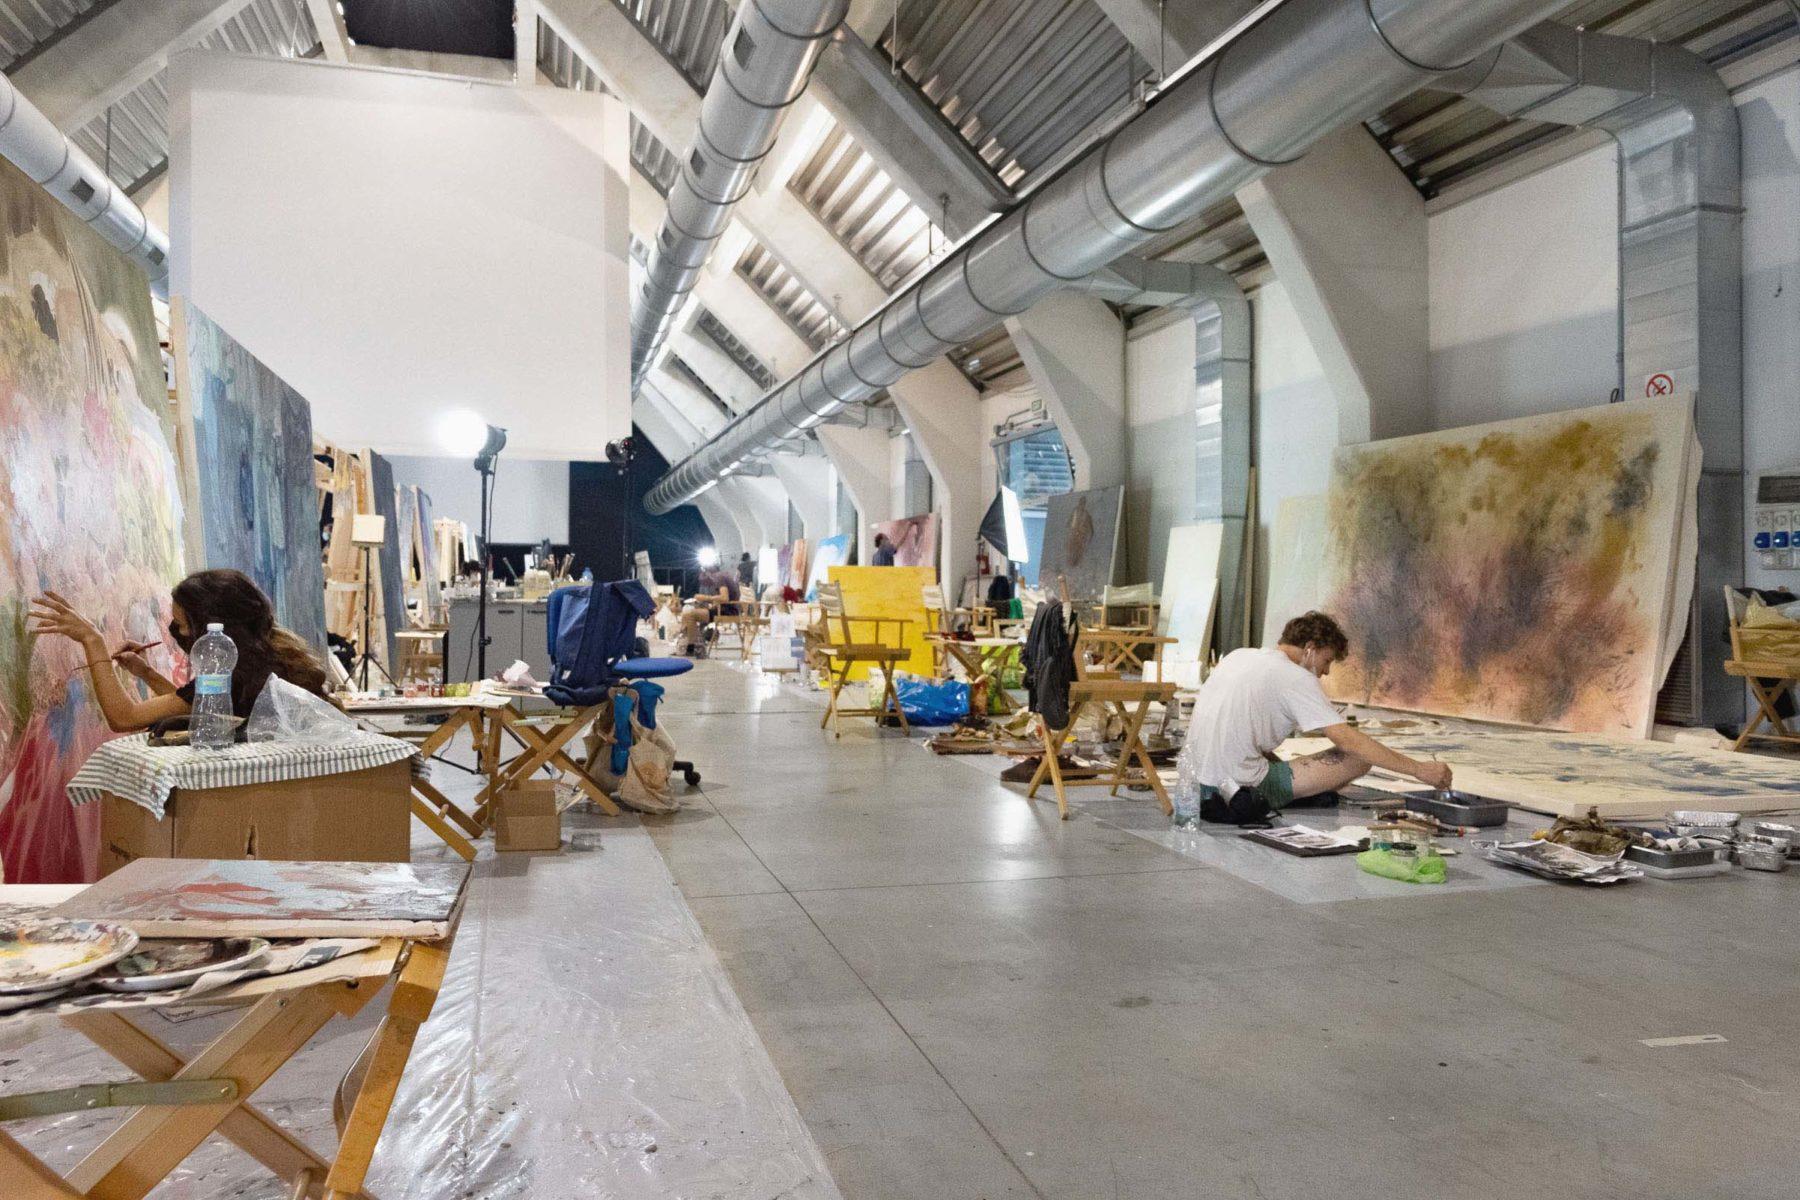 Extra Ordinario Workshop, 2020, Vulcano, Venezia Marghera, ph. C. Bettio